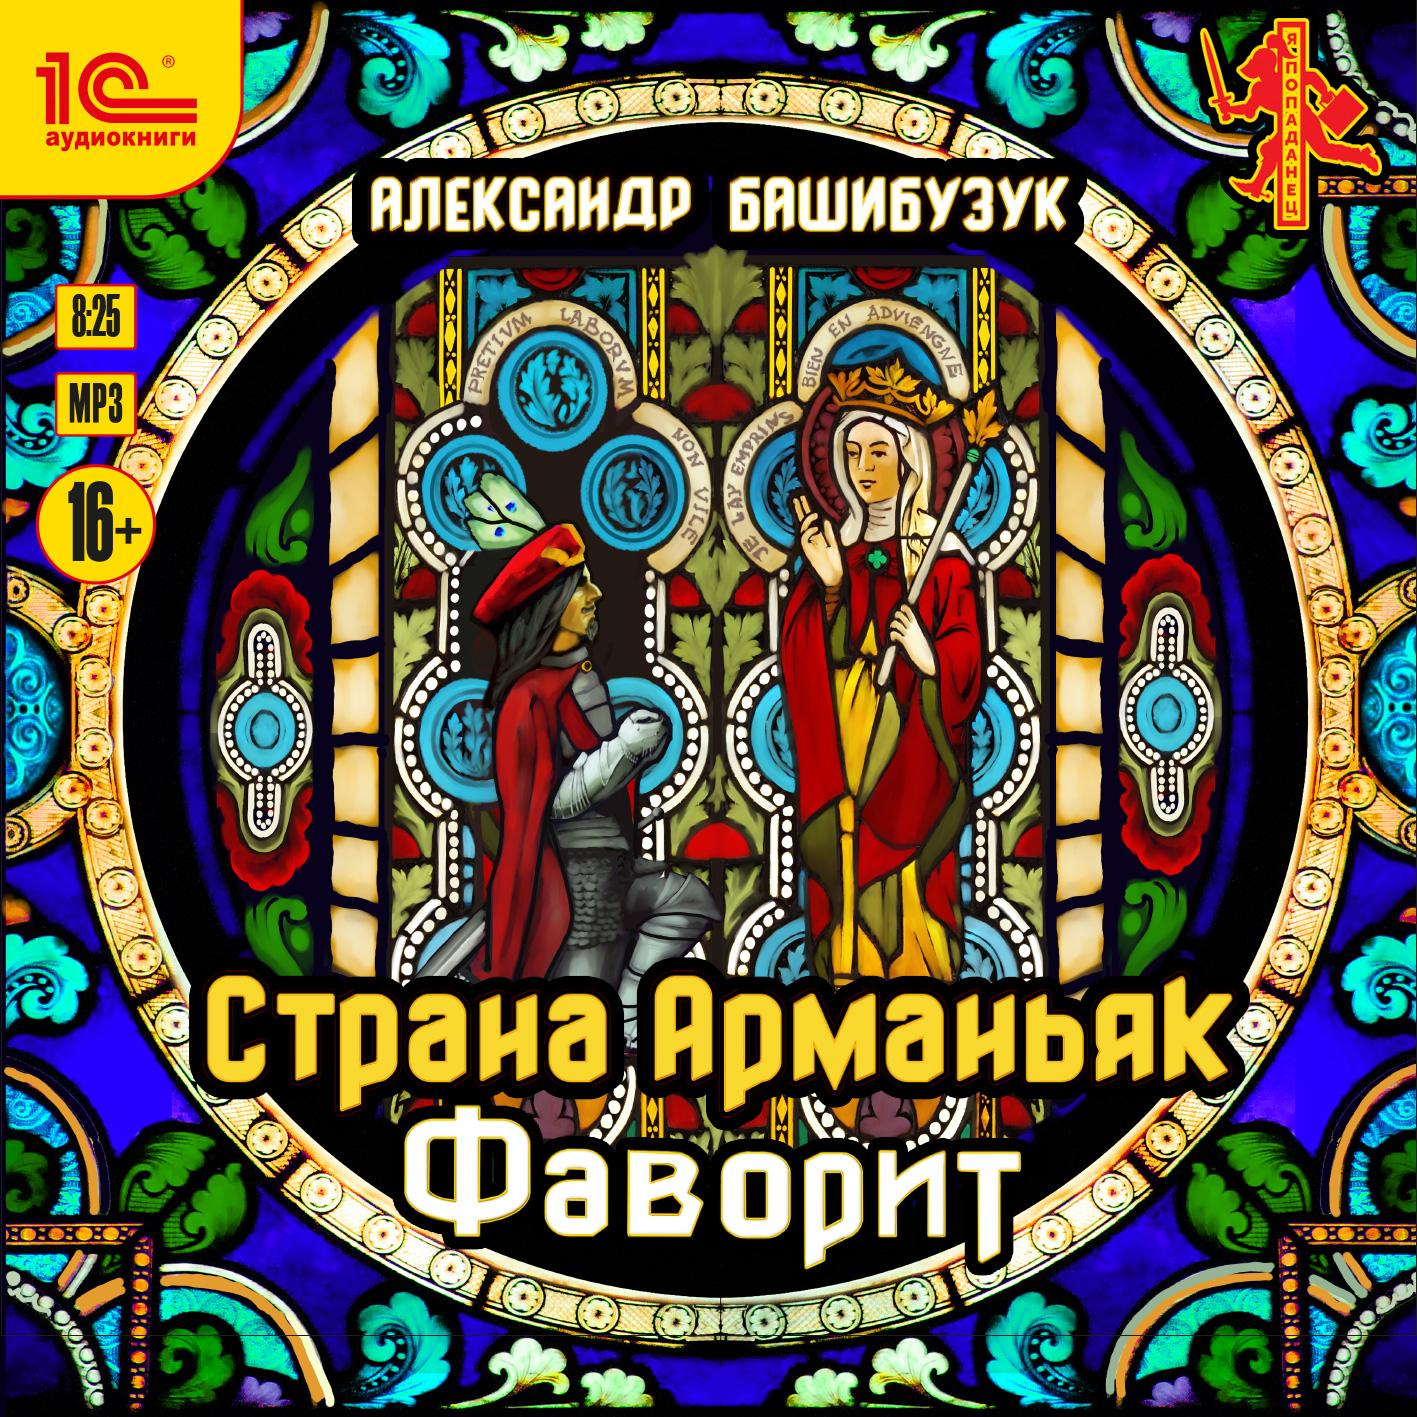 Александр Башибузук Страна Арманьяк: Фаворит. Книга 4 (цифровая версия) (Цифровая версия)